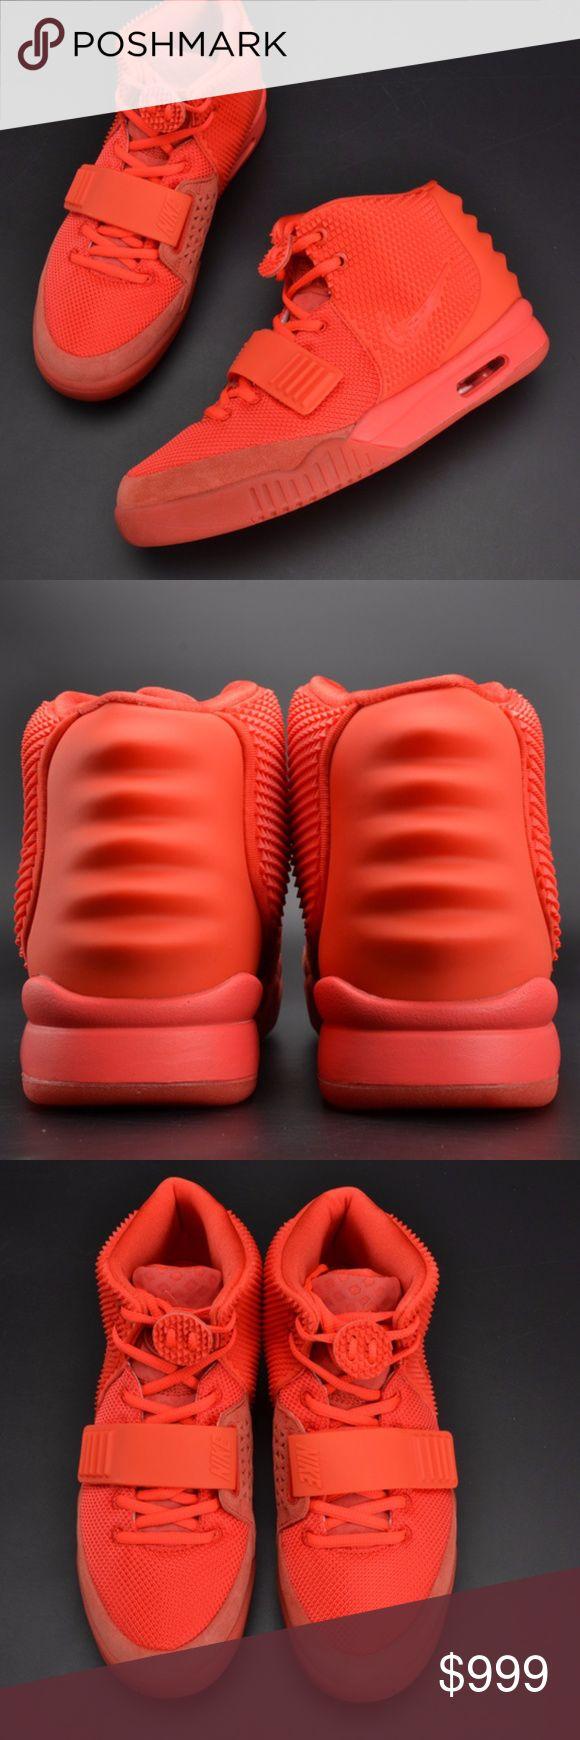 Nike Air Yeezy 2 Red October Nike Air Yeezy 2 Red October Nike Shoes Sneakers